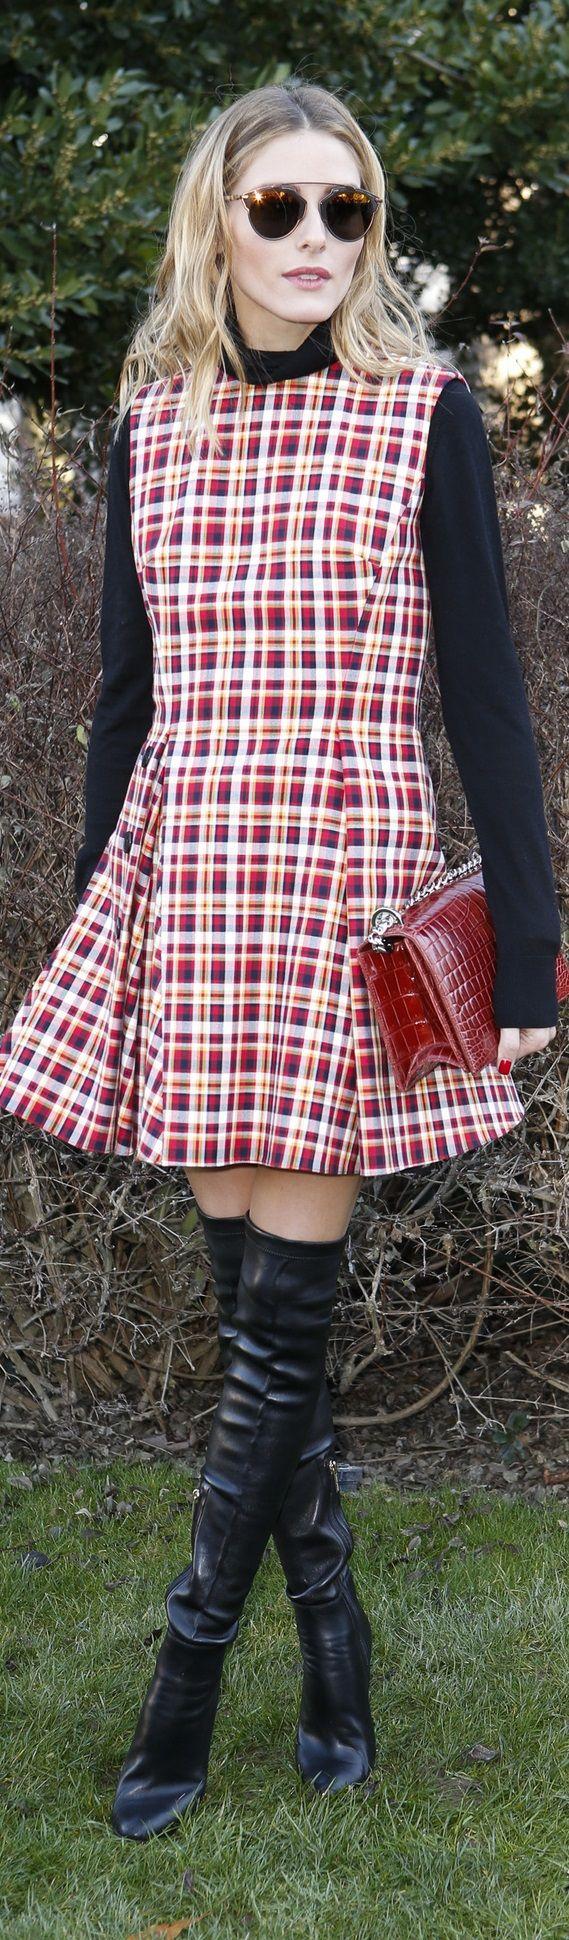 68 best Fashion: Christian Dior Red Carpet images on Pinterest ...